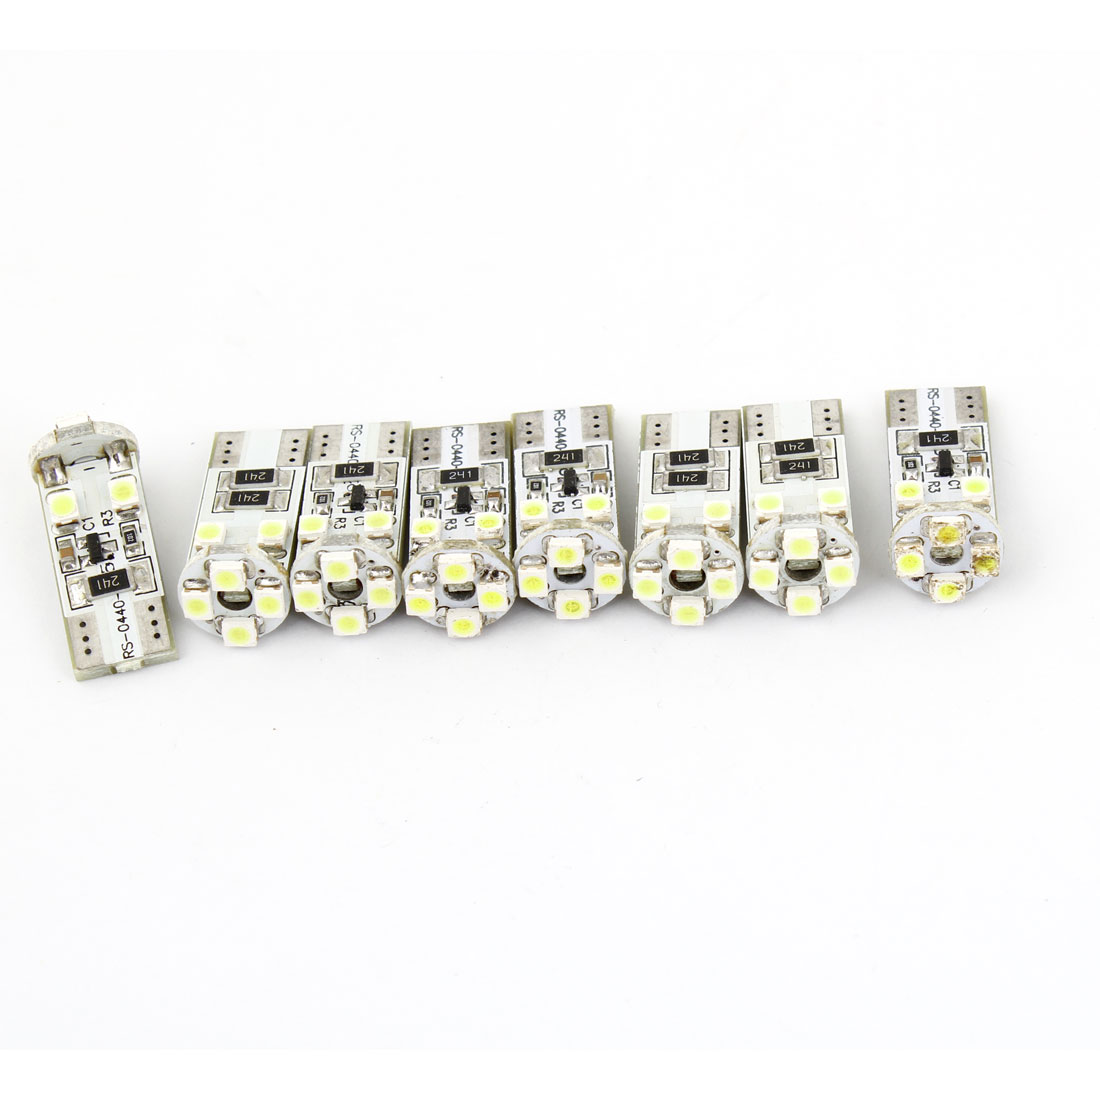 8 x Error Free T10 White 8 1210 3528 SMD LED Dashboard Turn Side Light Bulb